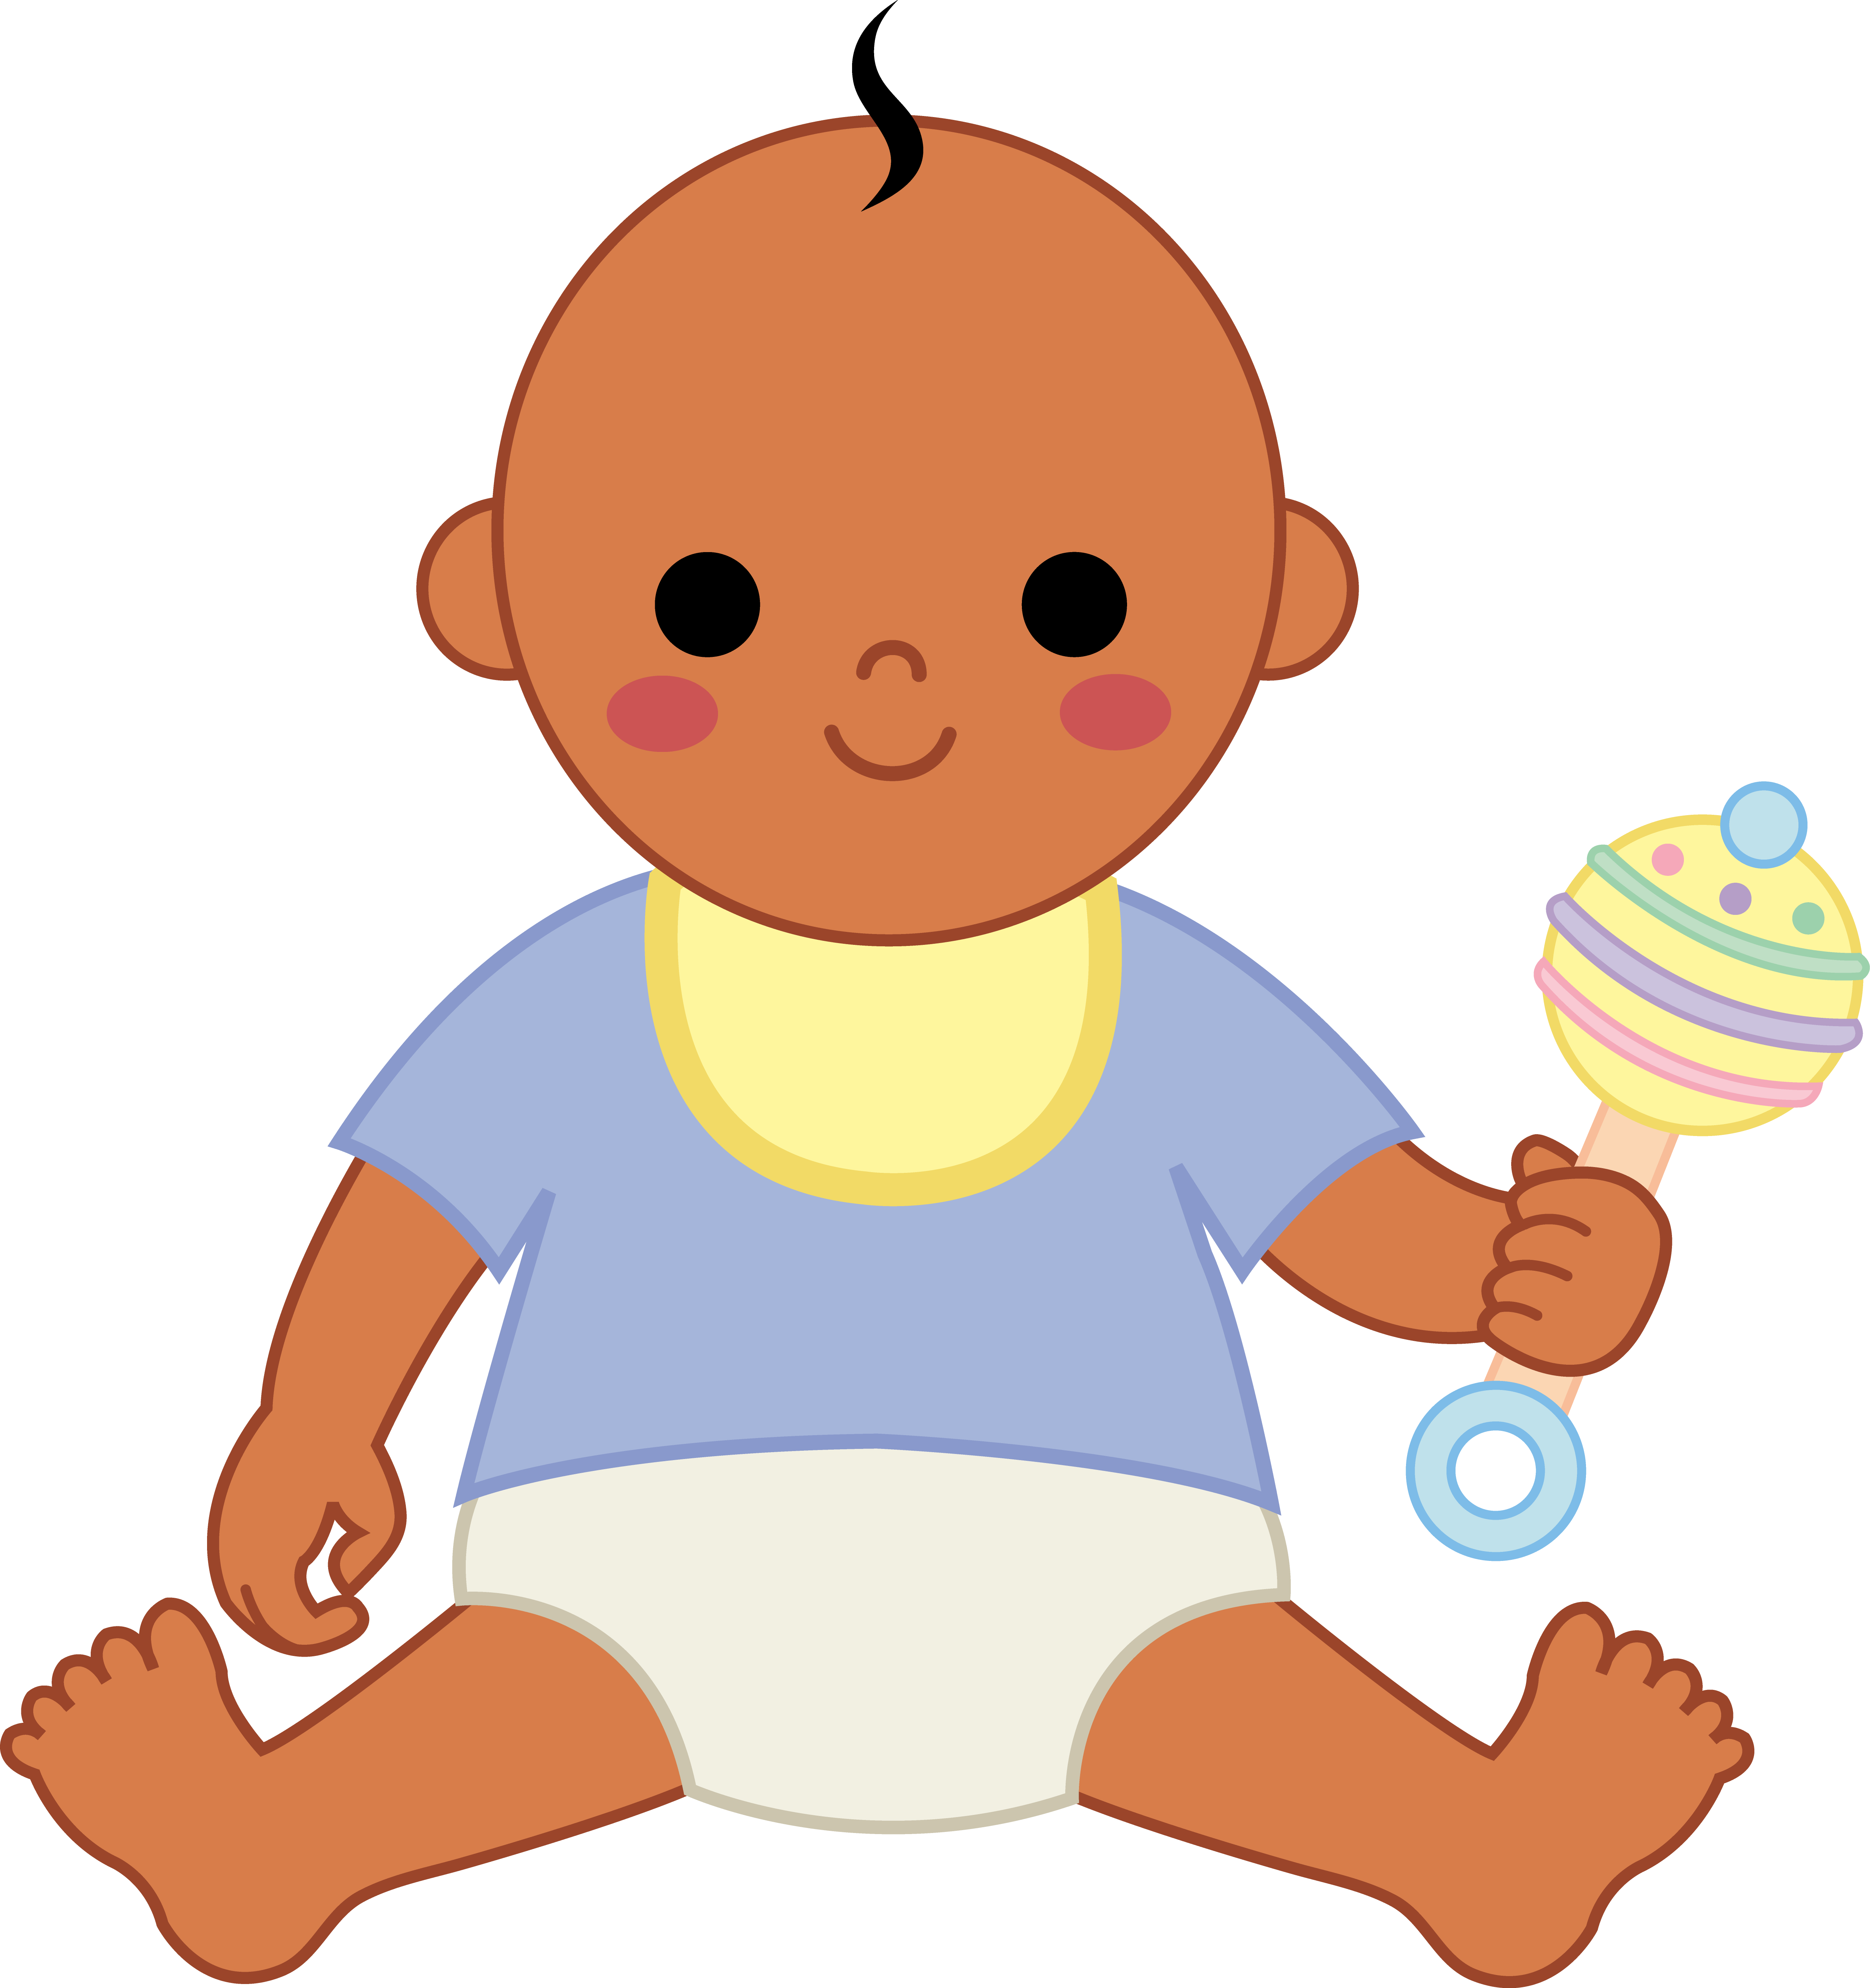 5175x5502 Baby Boy Clip Art Baby Clipart Image 2 3